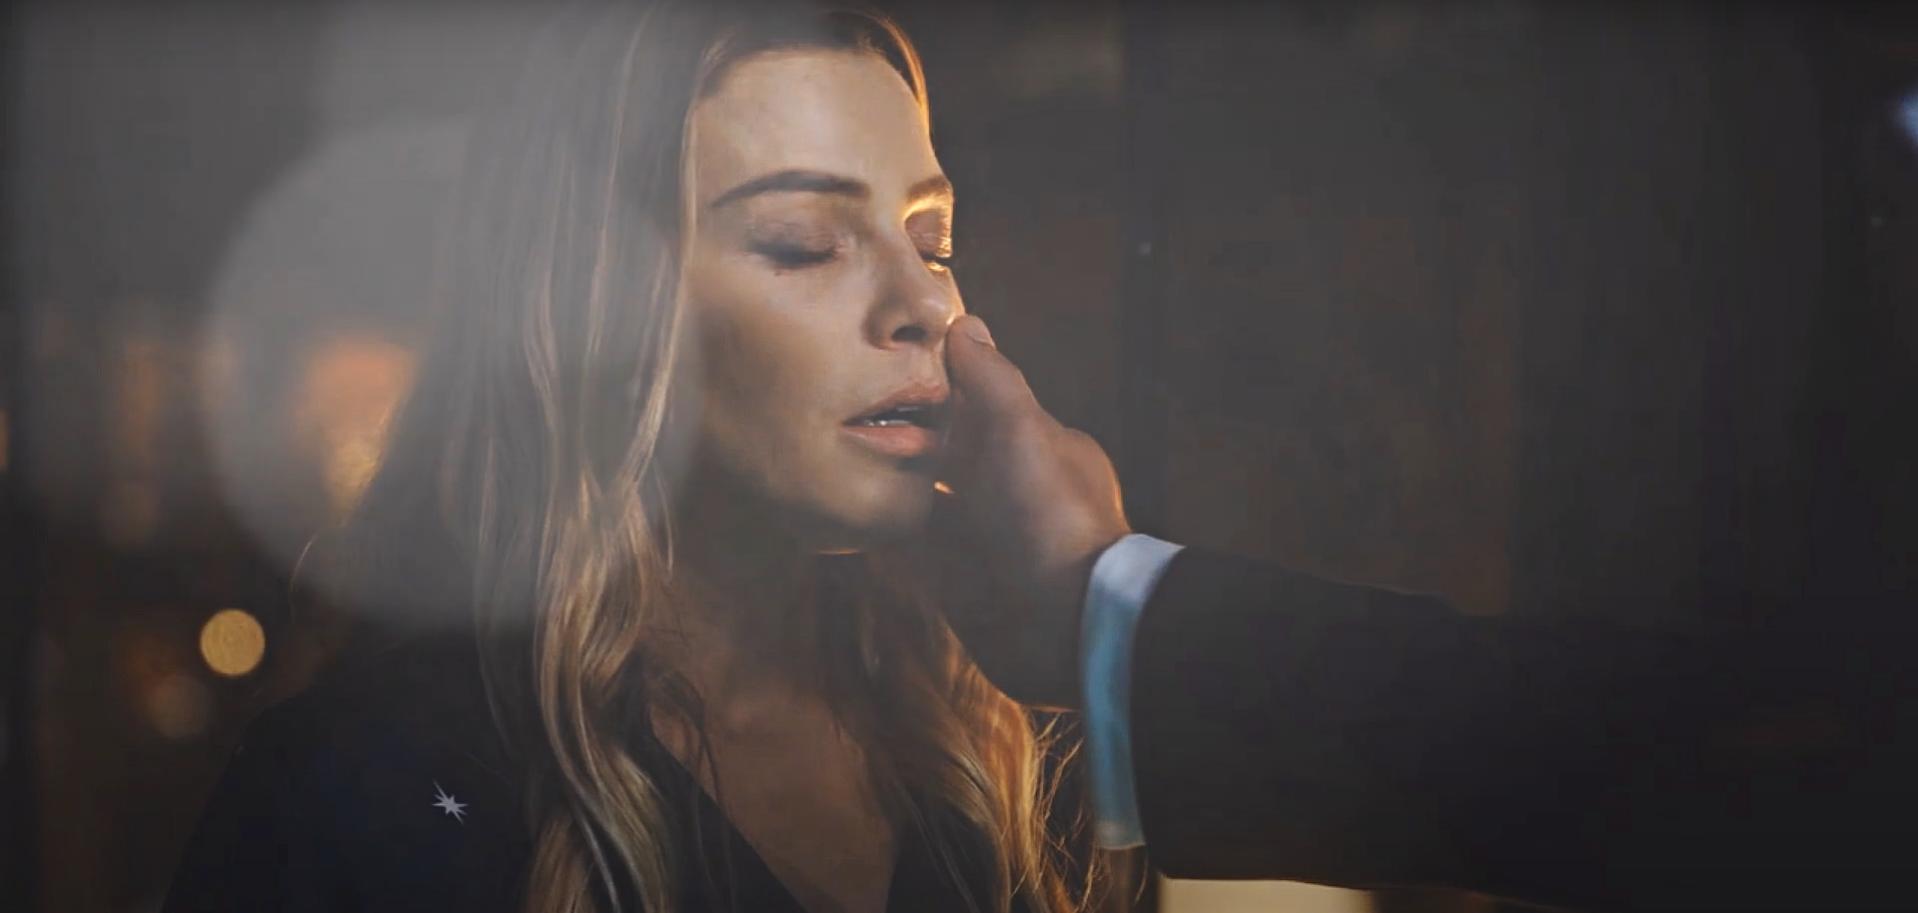 Скриншот 4 сезон Люцифер и Хлоя